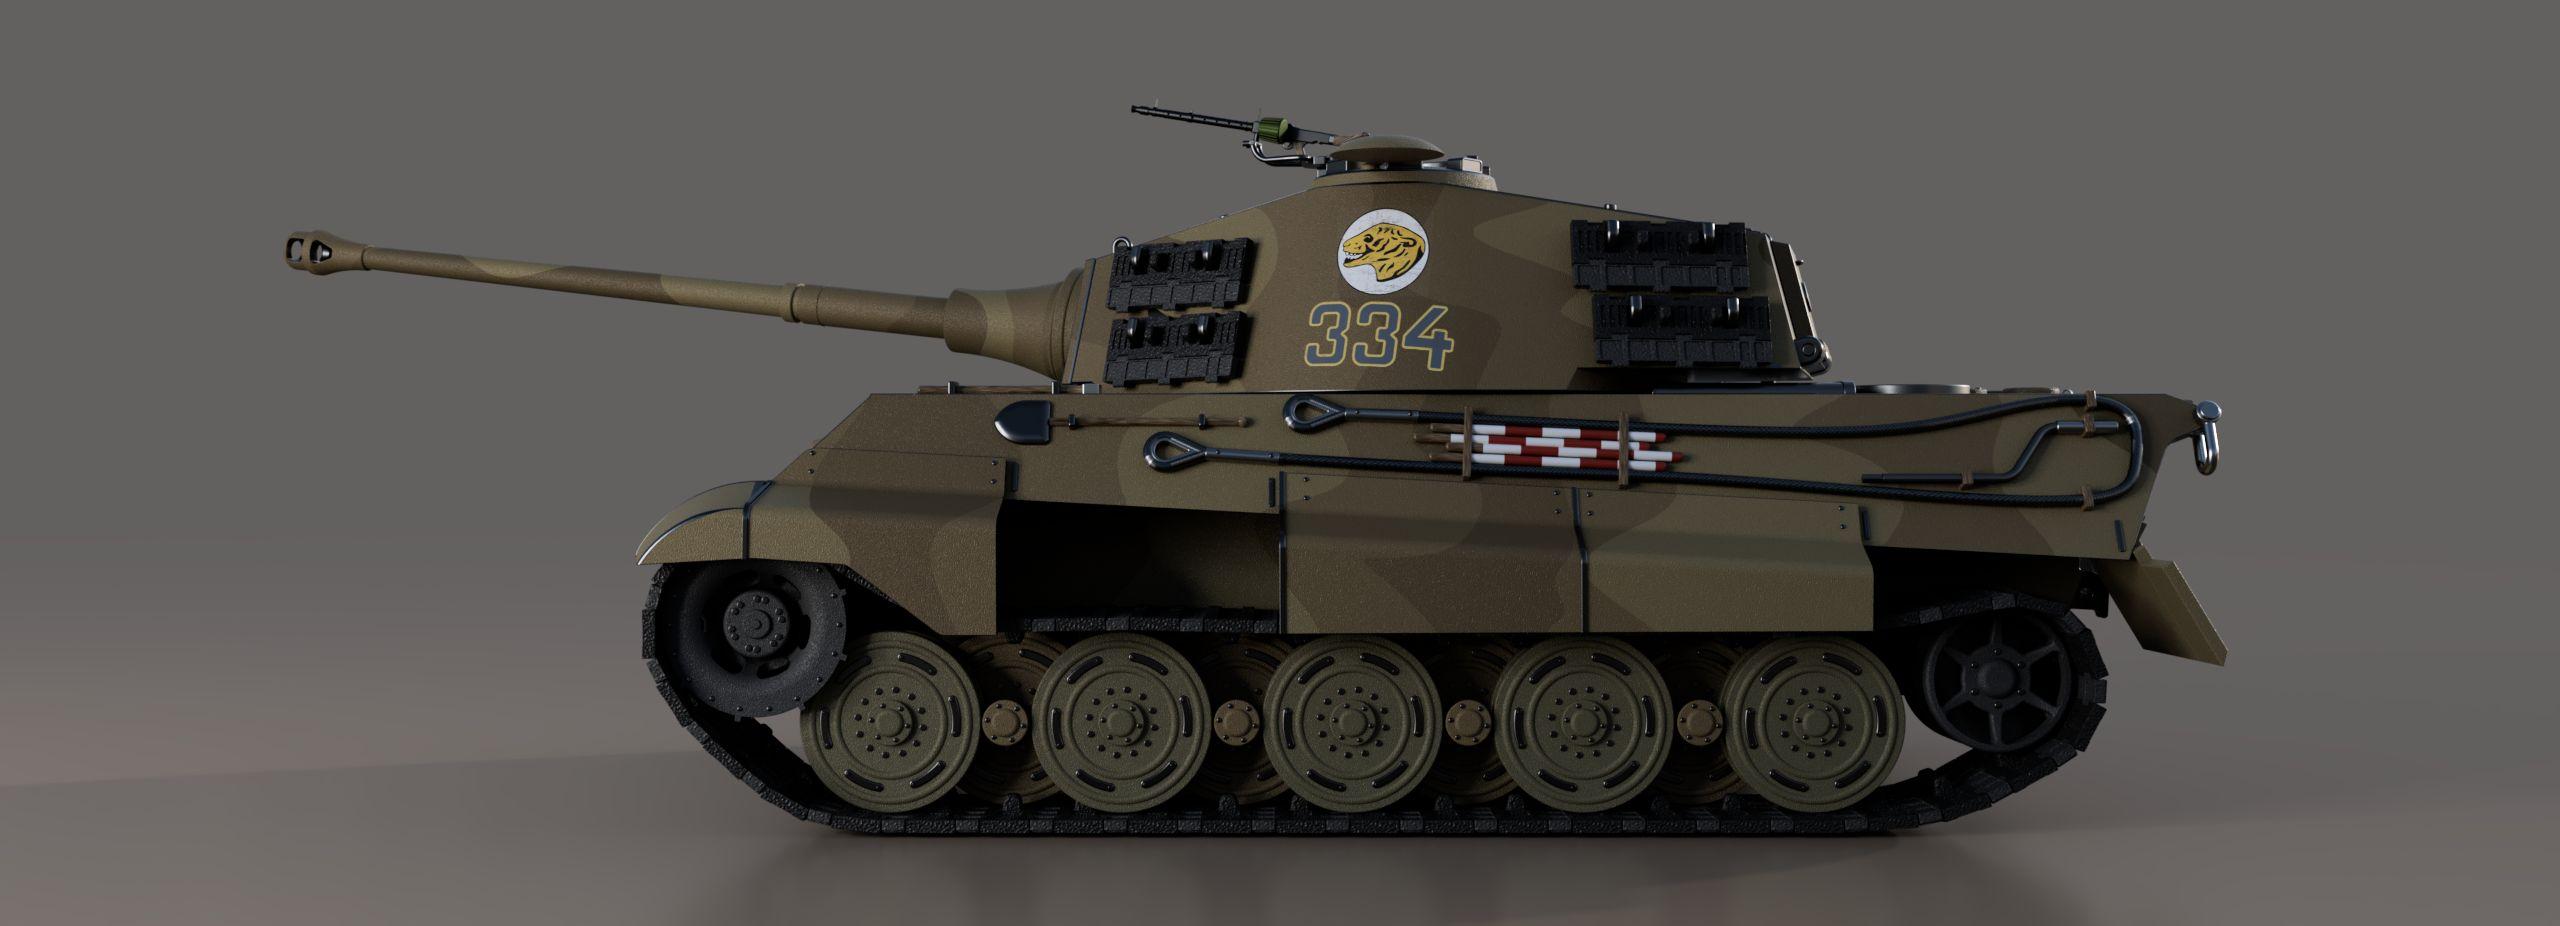 Tiger-ii-komplett-wuste-2018-sep-20-08-27-01am-000-customizedview2339018176-png-3500-3500